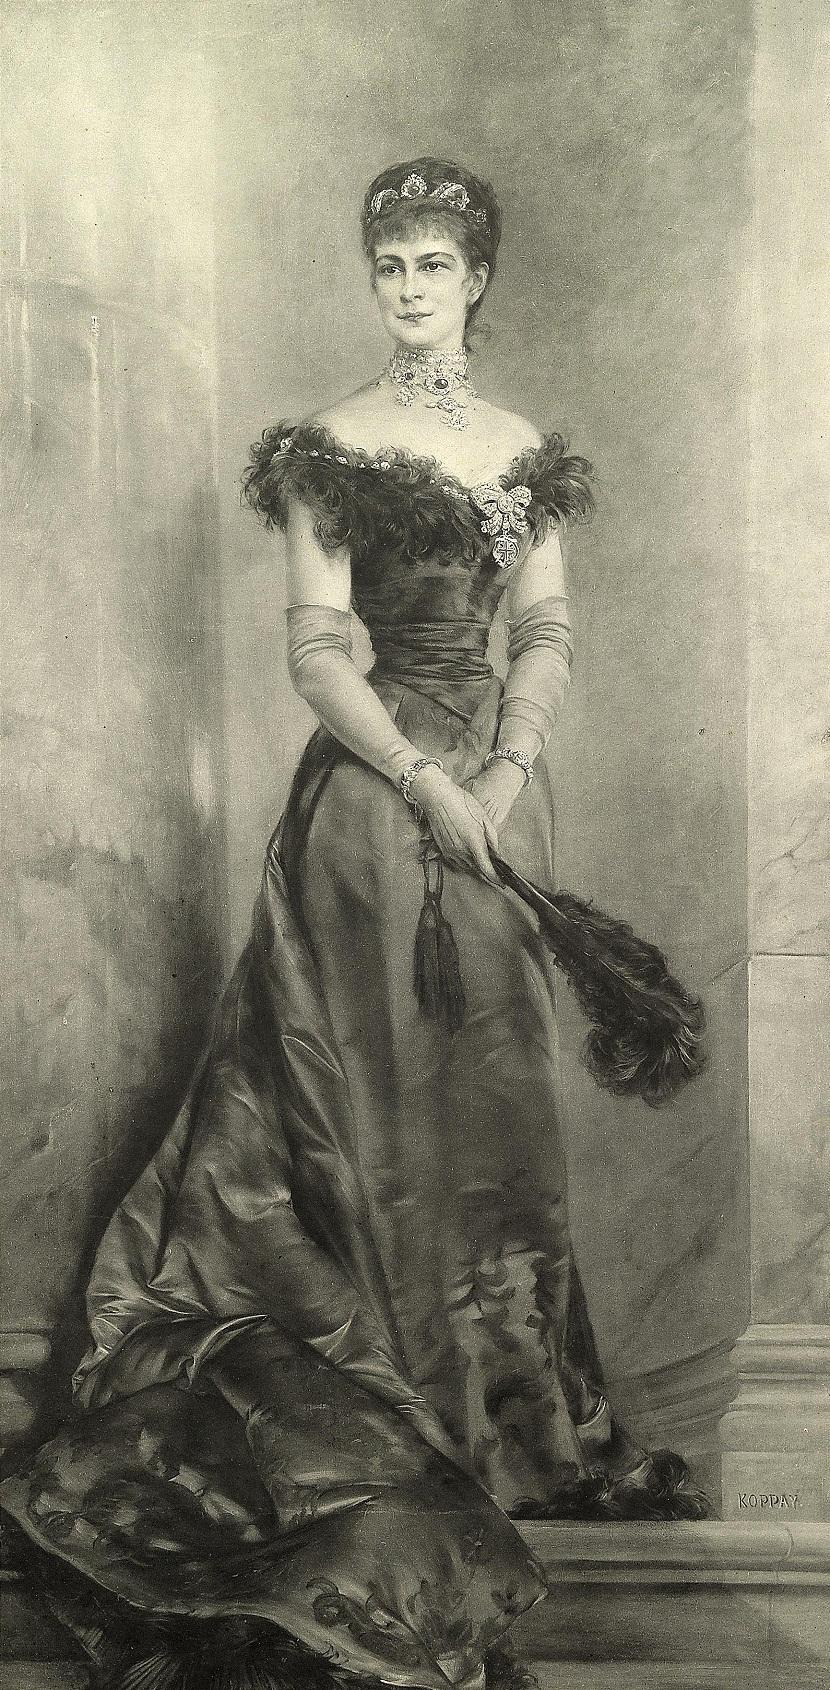 Josef-Arpad-Koppay-1859-1927-Kaiserin-Elisabeth.jpg